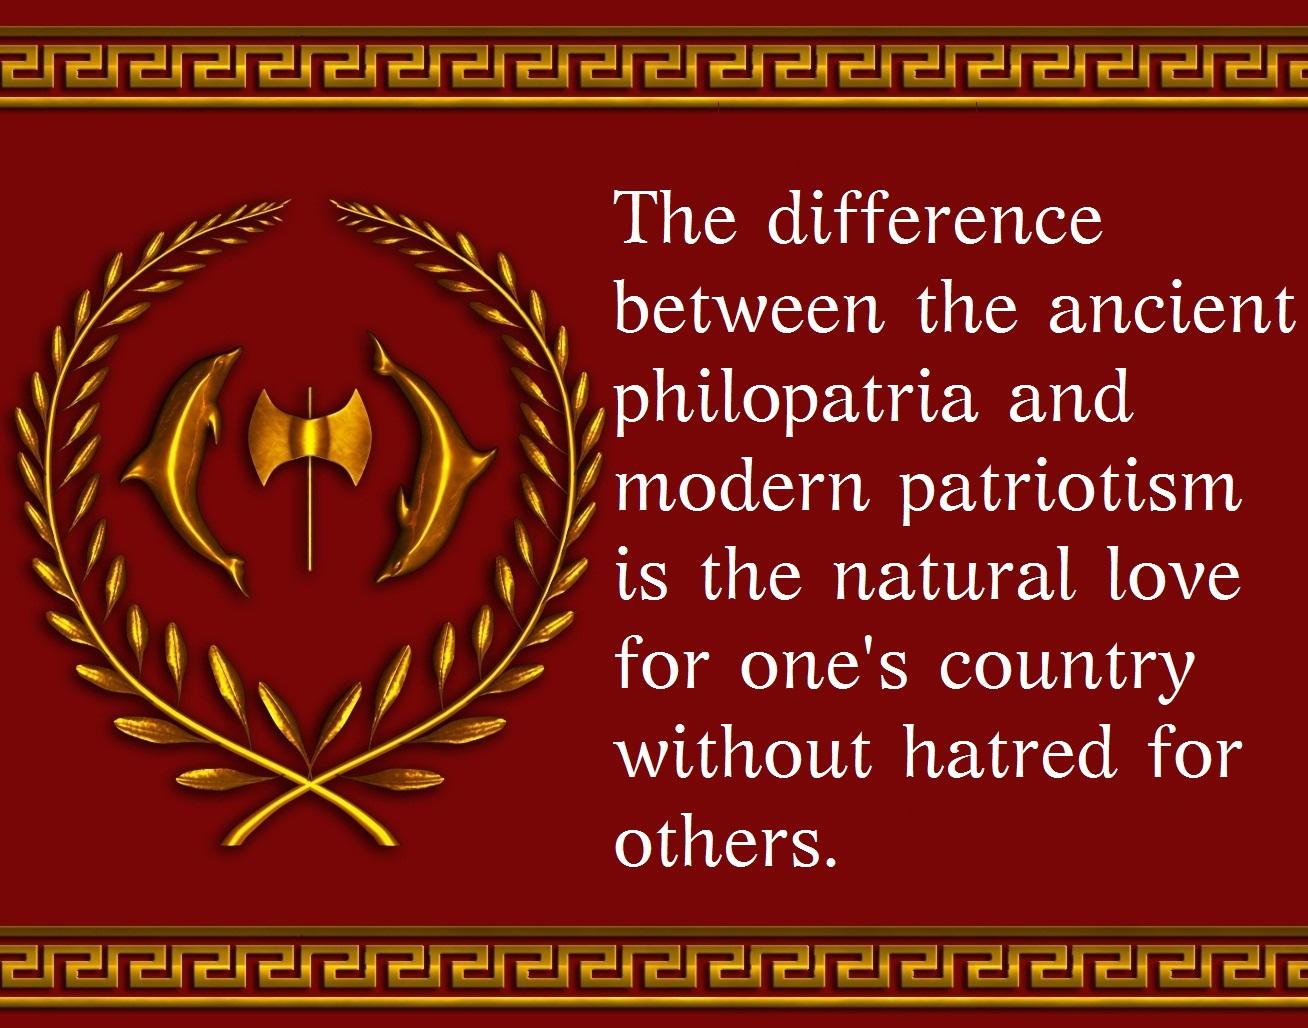 Philopatria